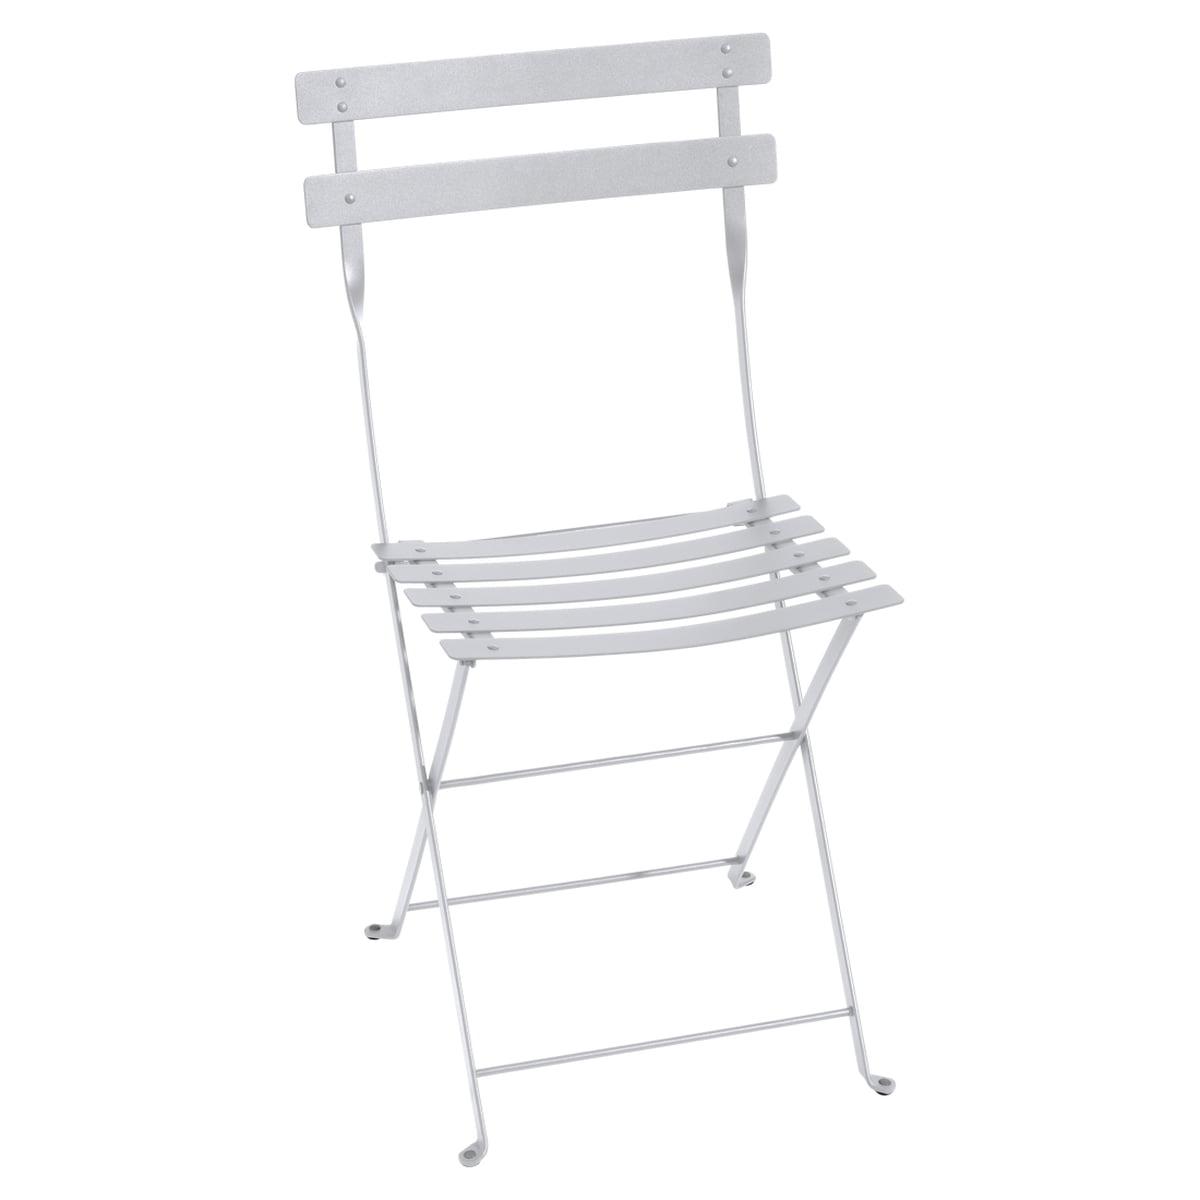 Klappstuhl holz metall  weiße metall klappstühle | Möbelideen